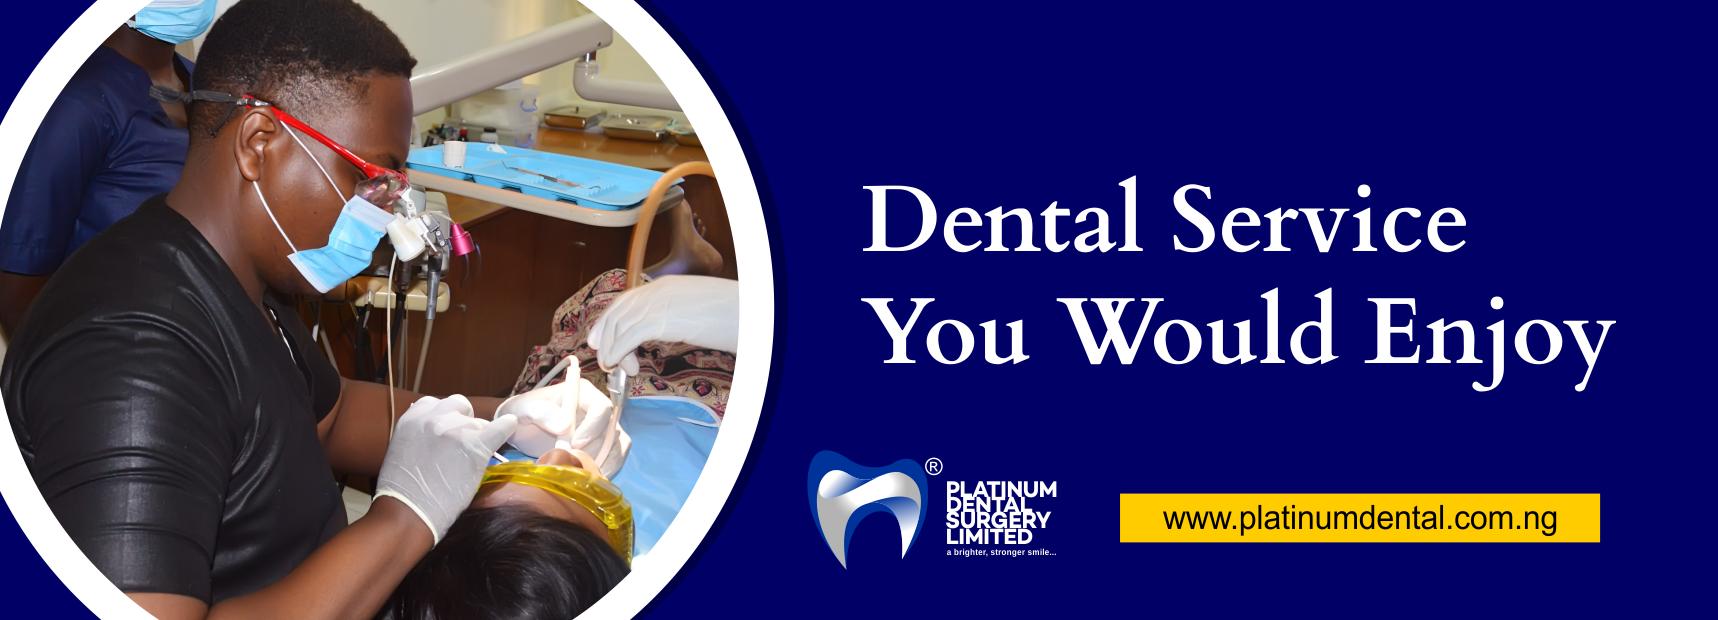 Dental Services You would Enjoy